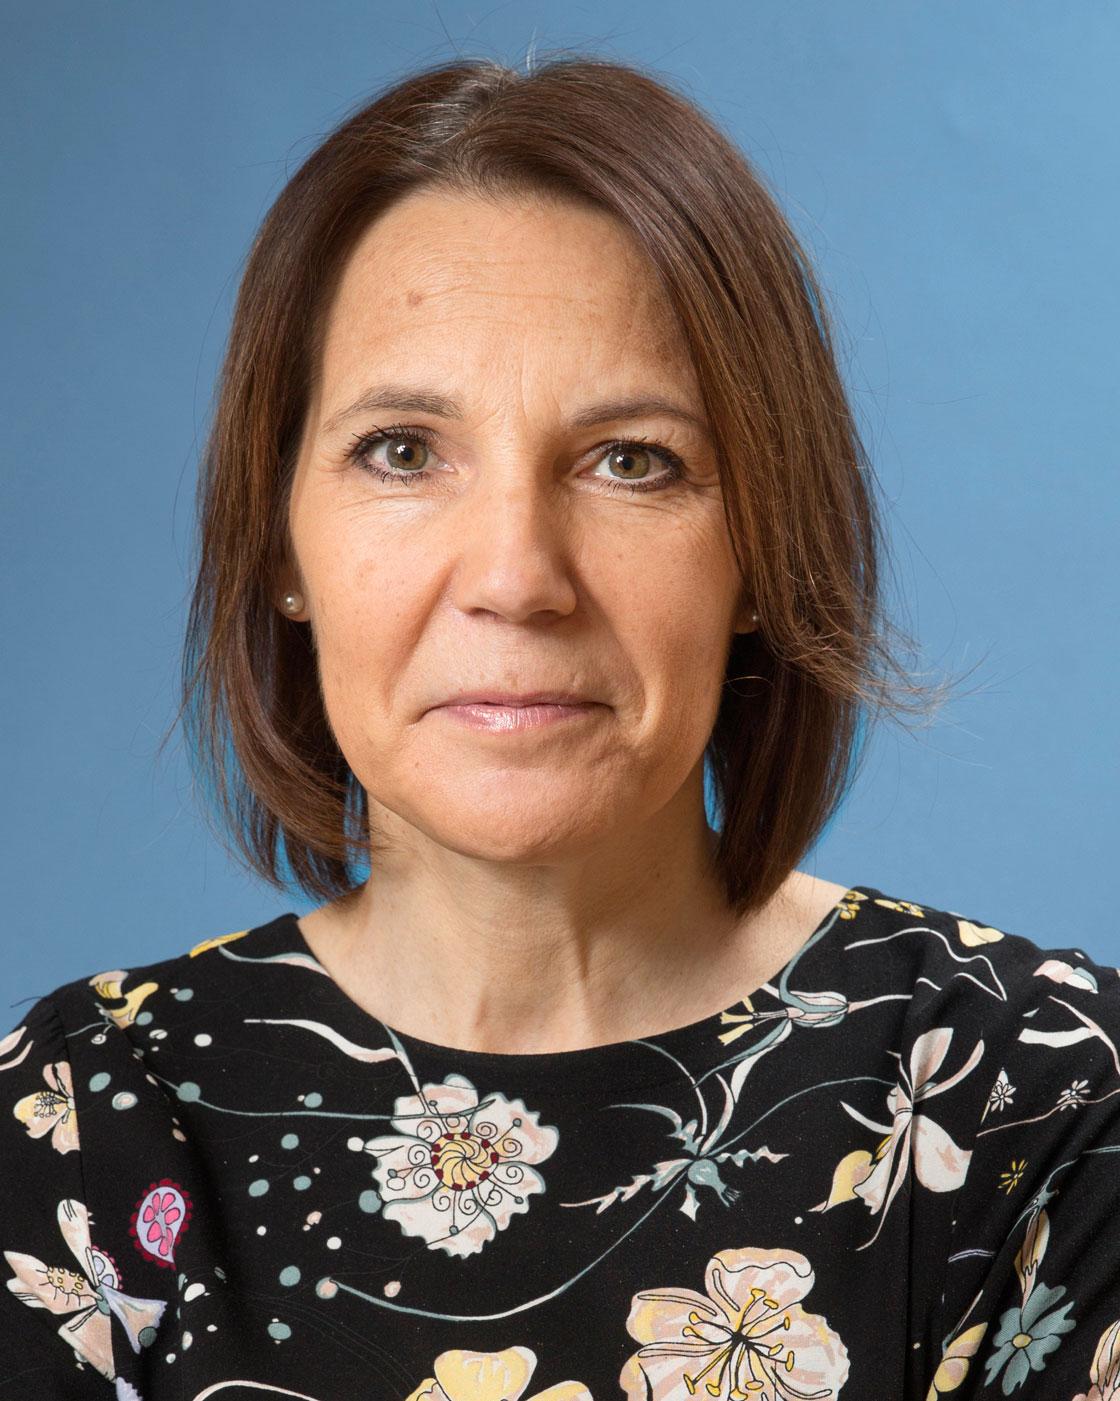 Eva-Lotta Sandström.